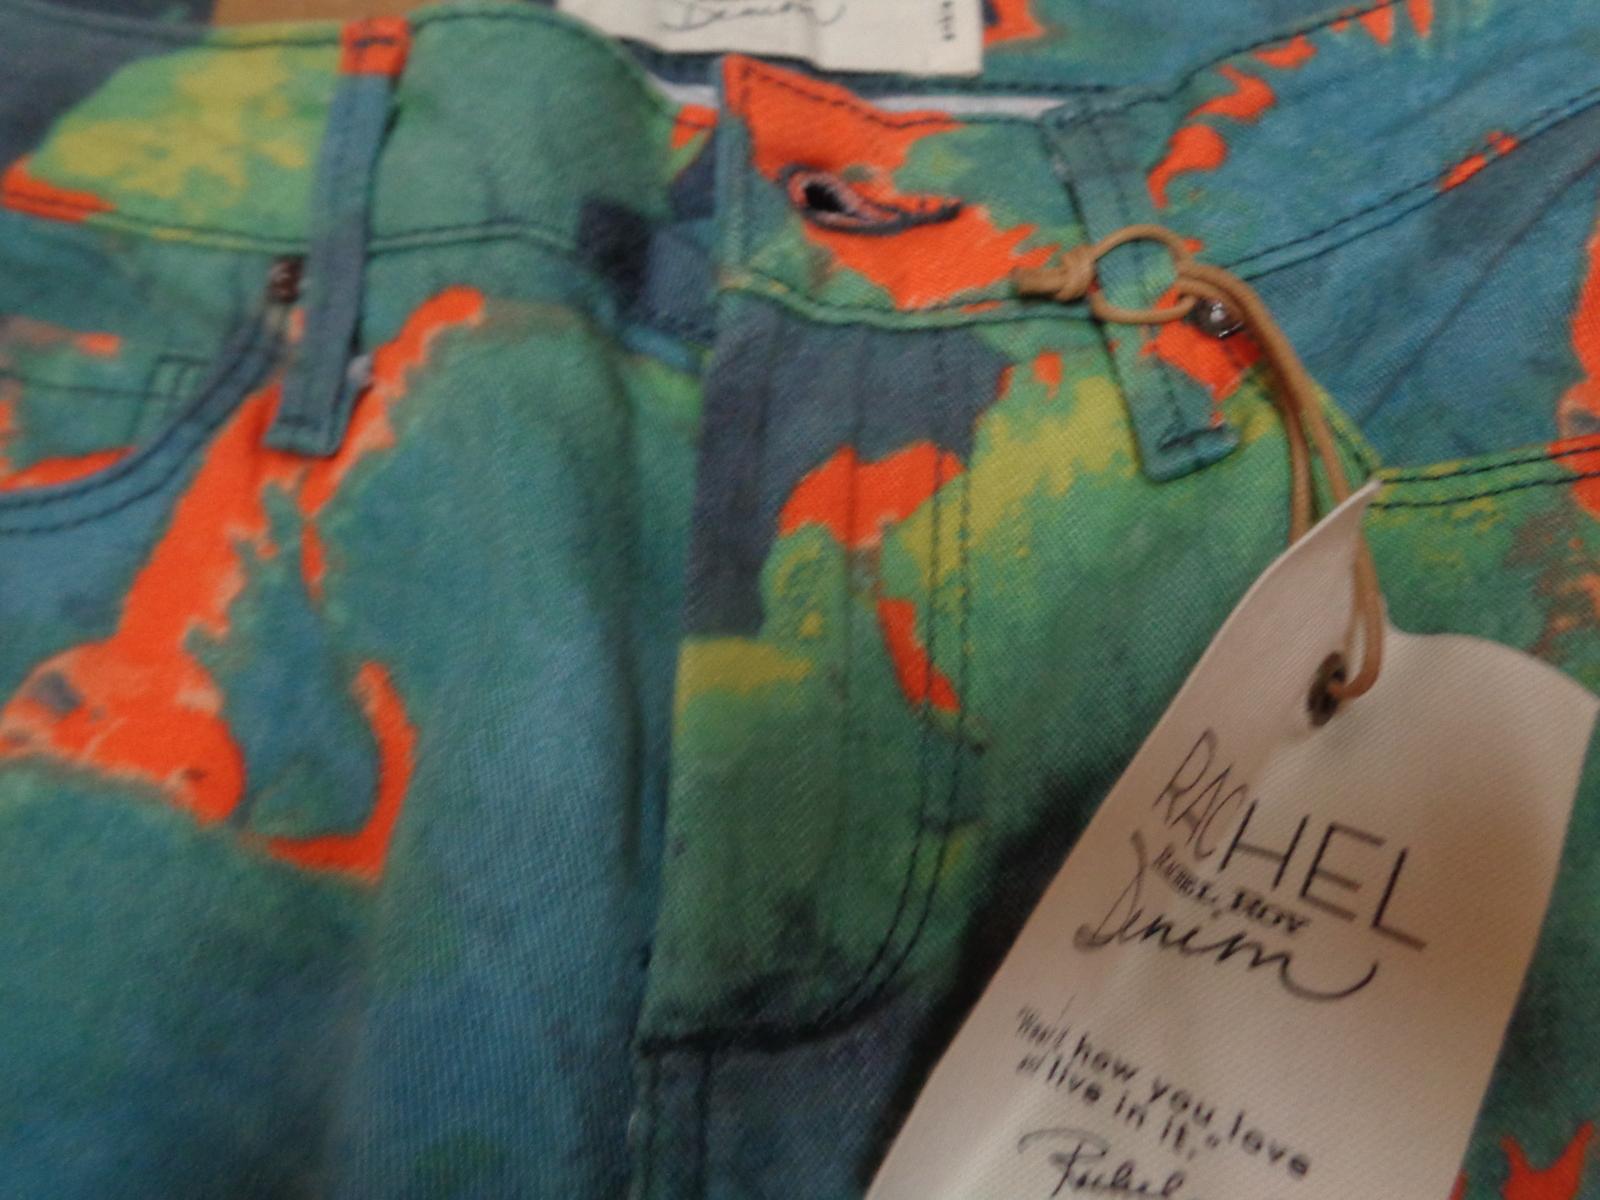 Rachel Denim Skinny Jeans Blue Dk Orchid NWT Youth SZ 8/9